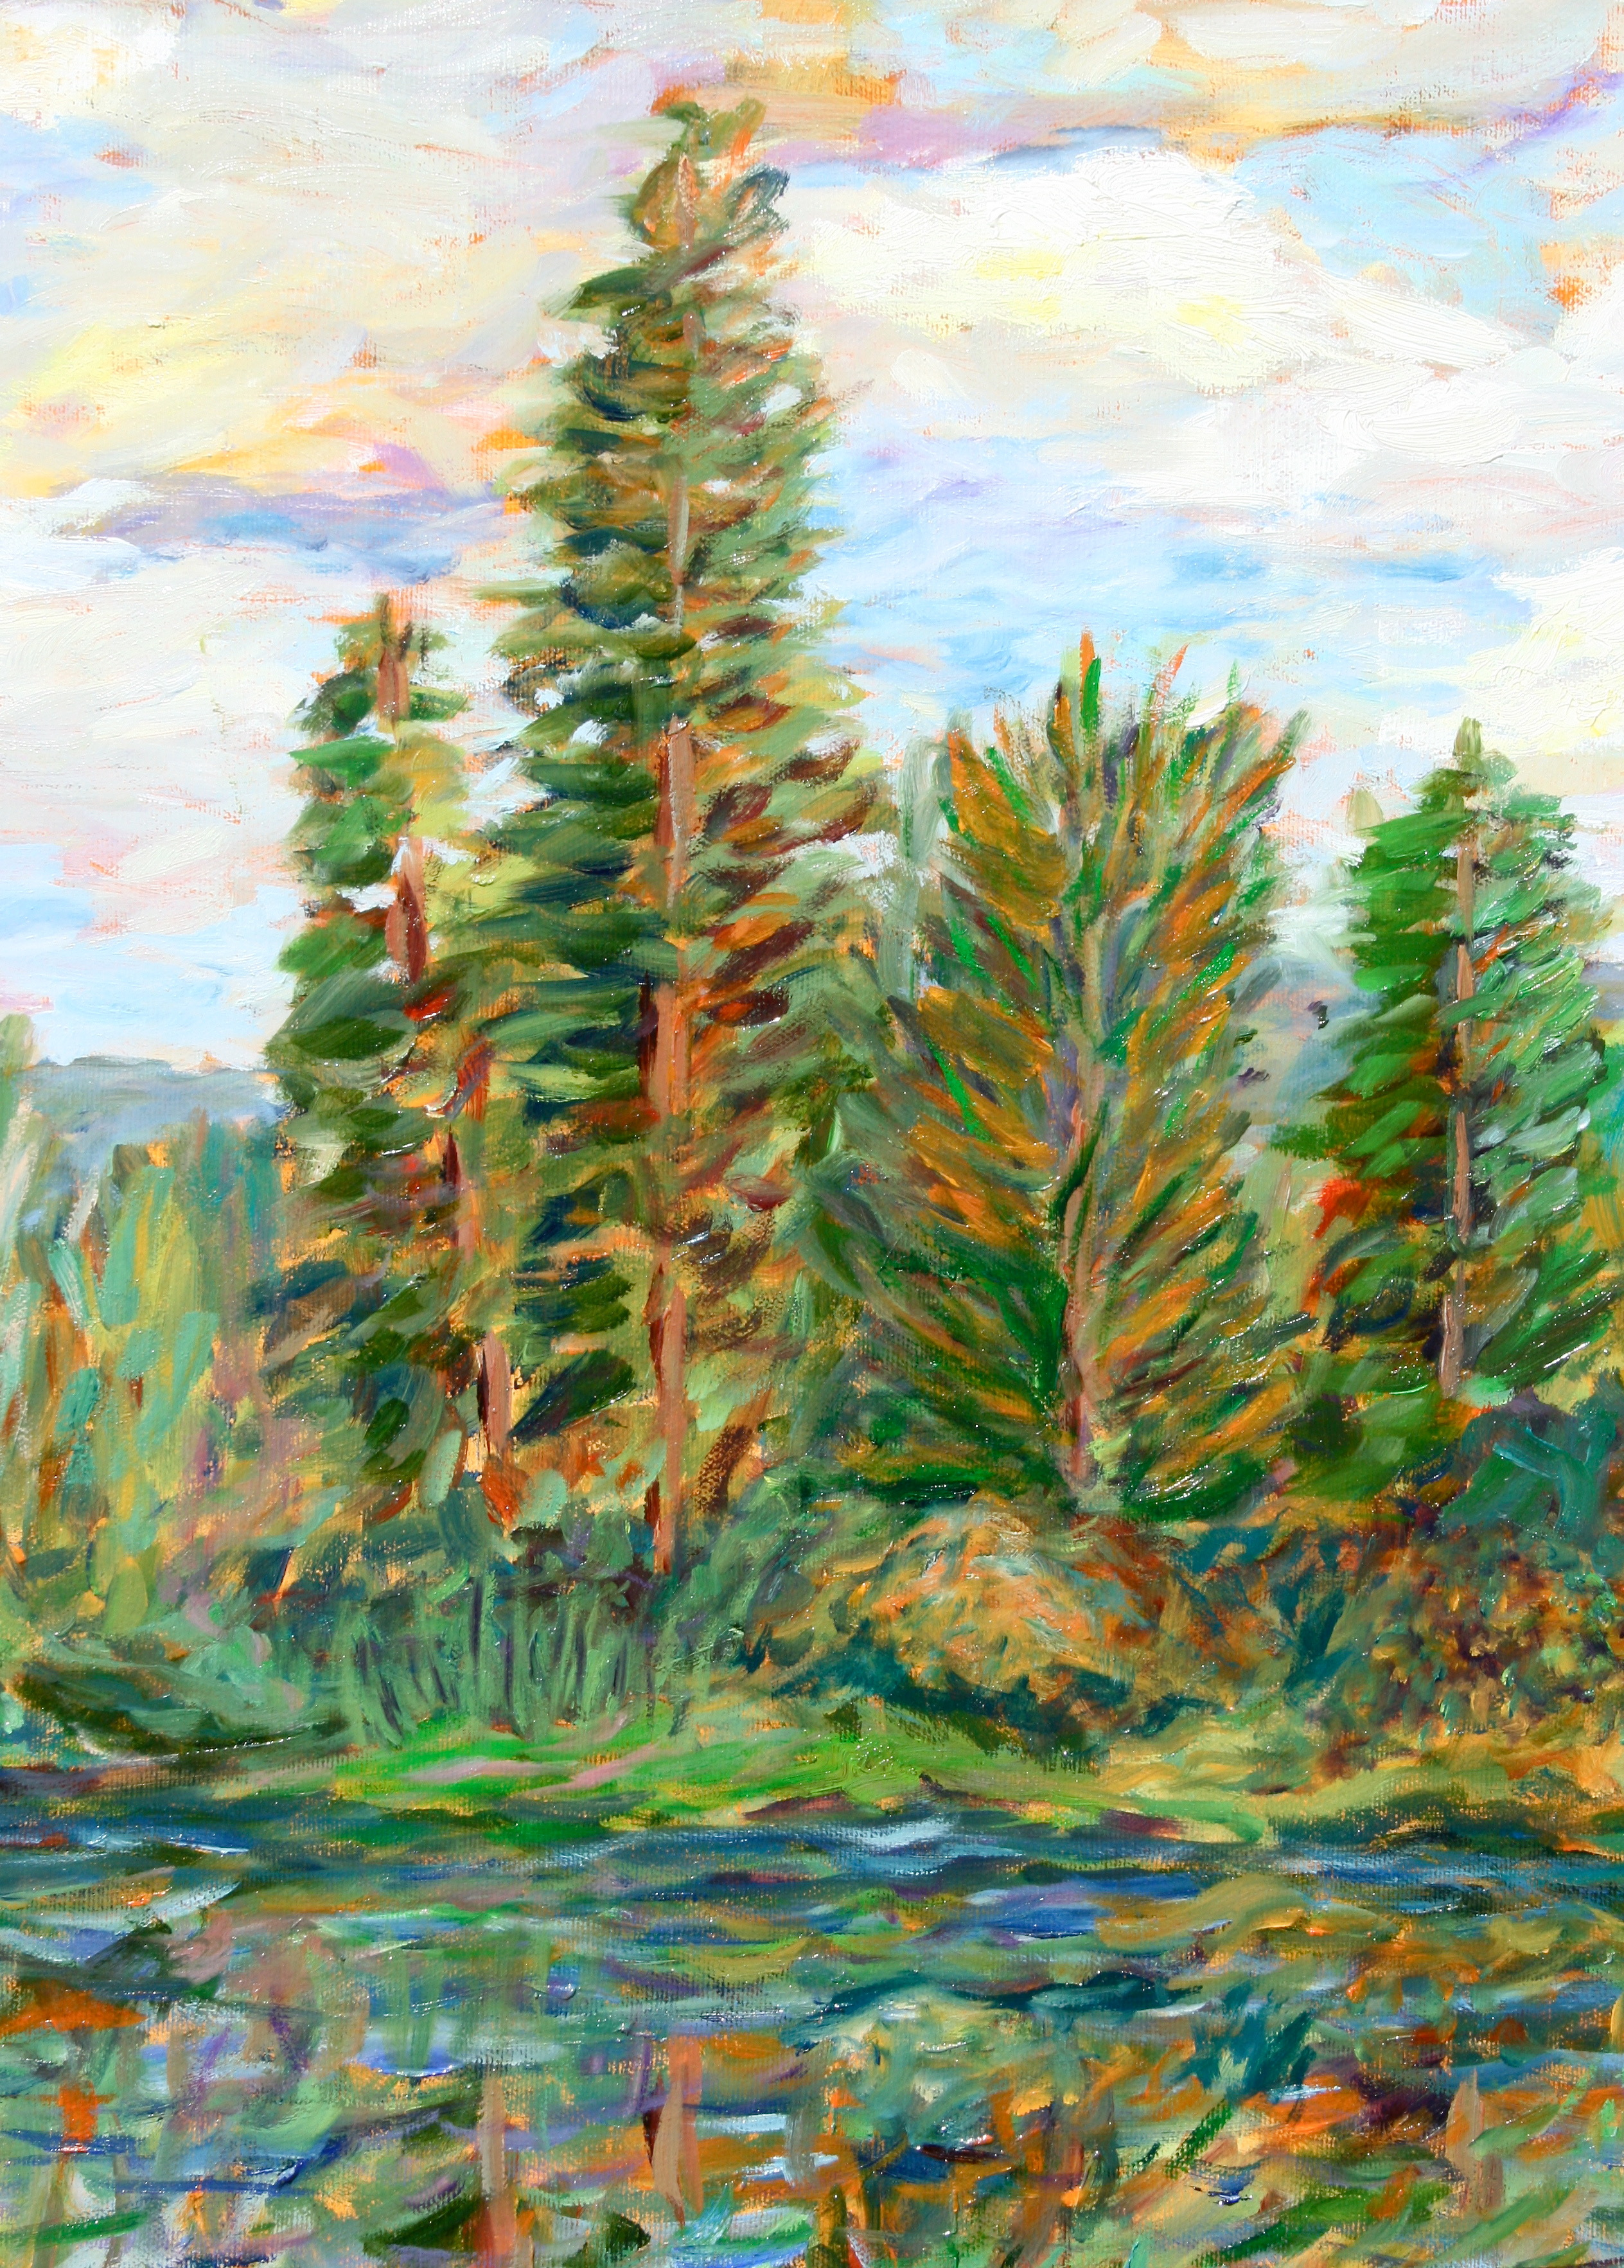 Heart Tree on Swan River (detail)